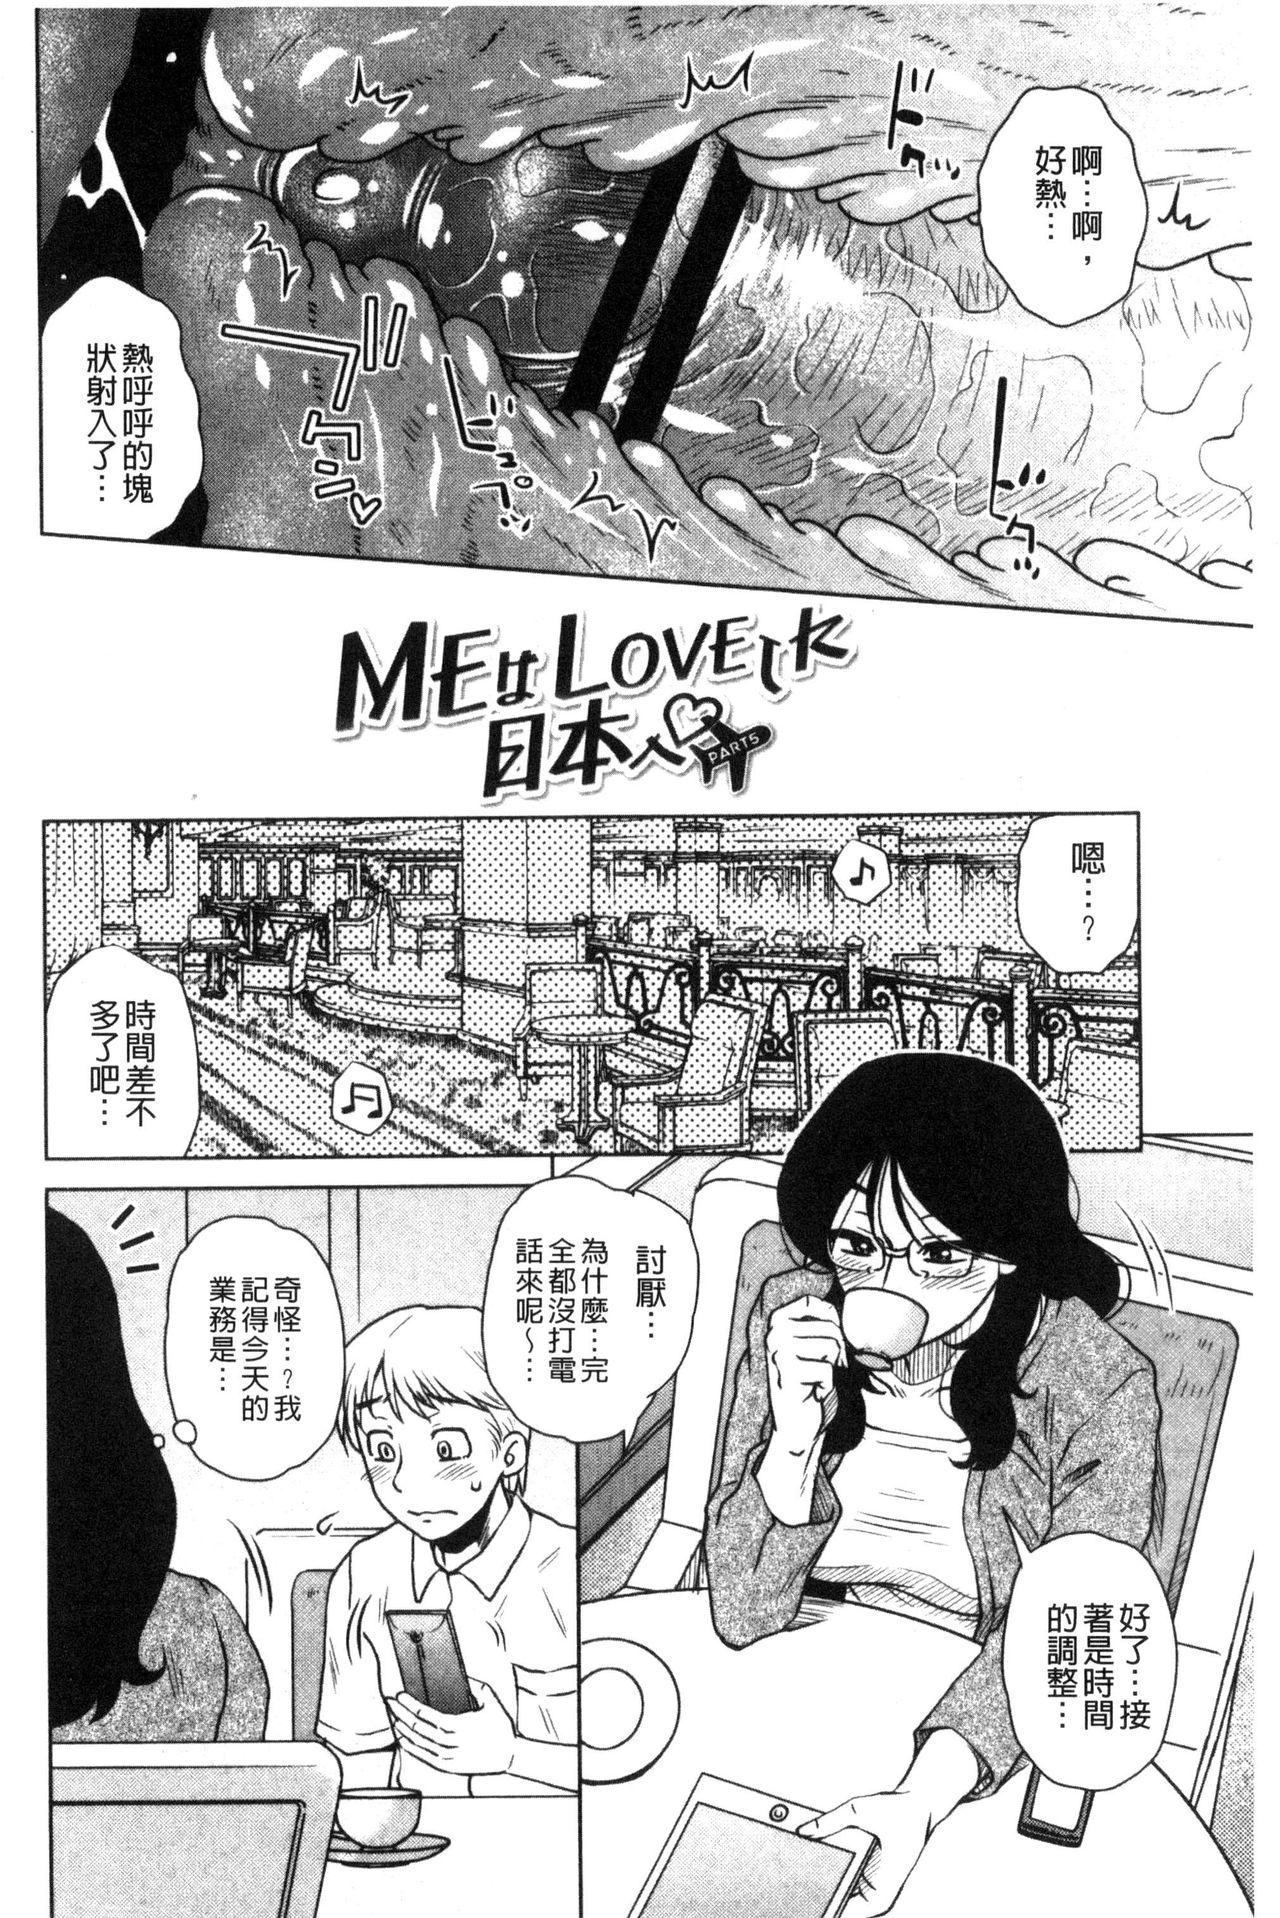 [Kurumiya Mashimin] Uchi no Shachou no Hamedere Inkatsu - Our President is HAME-DERE in Licentious sex life. [Chinese] 88